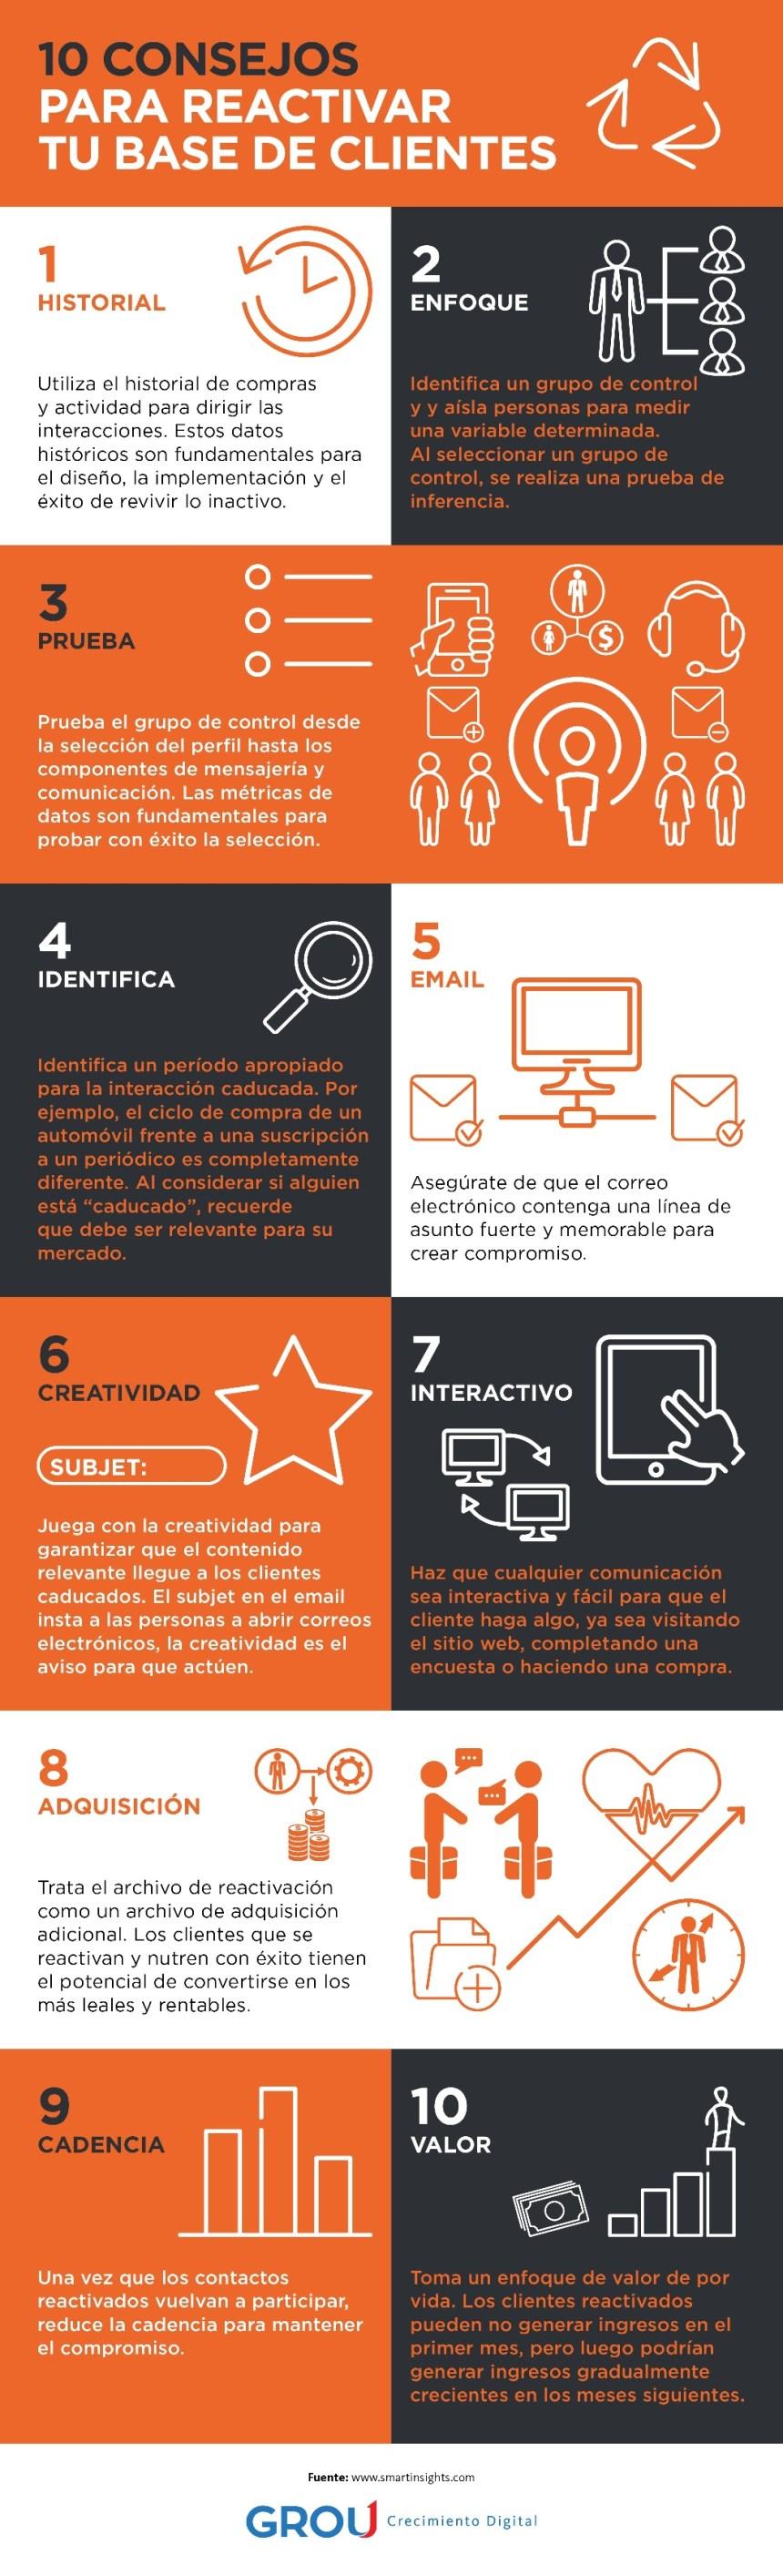 10 consejos para reactivar la base de clientes